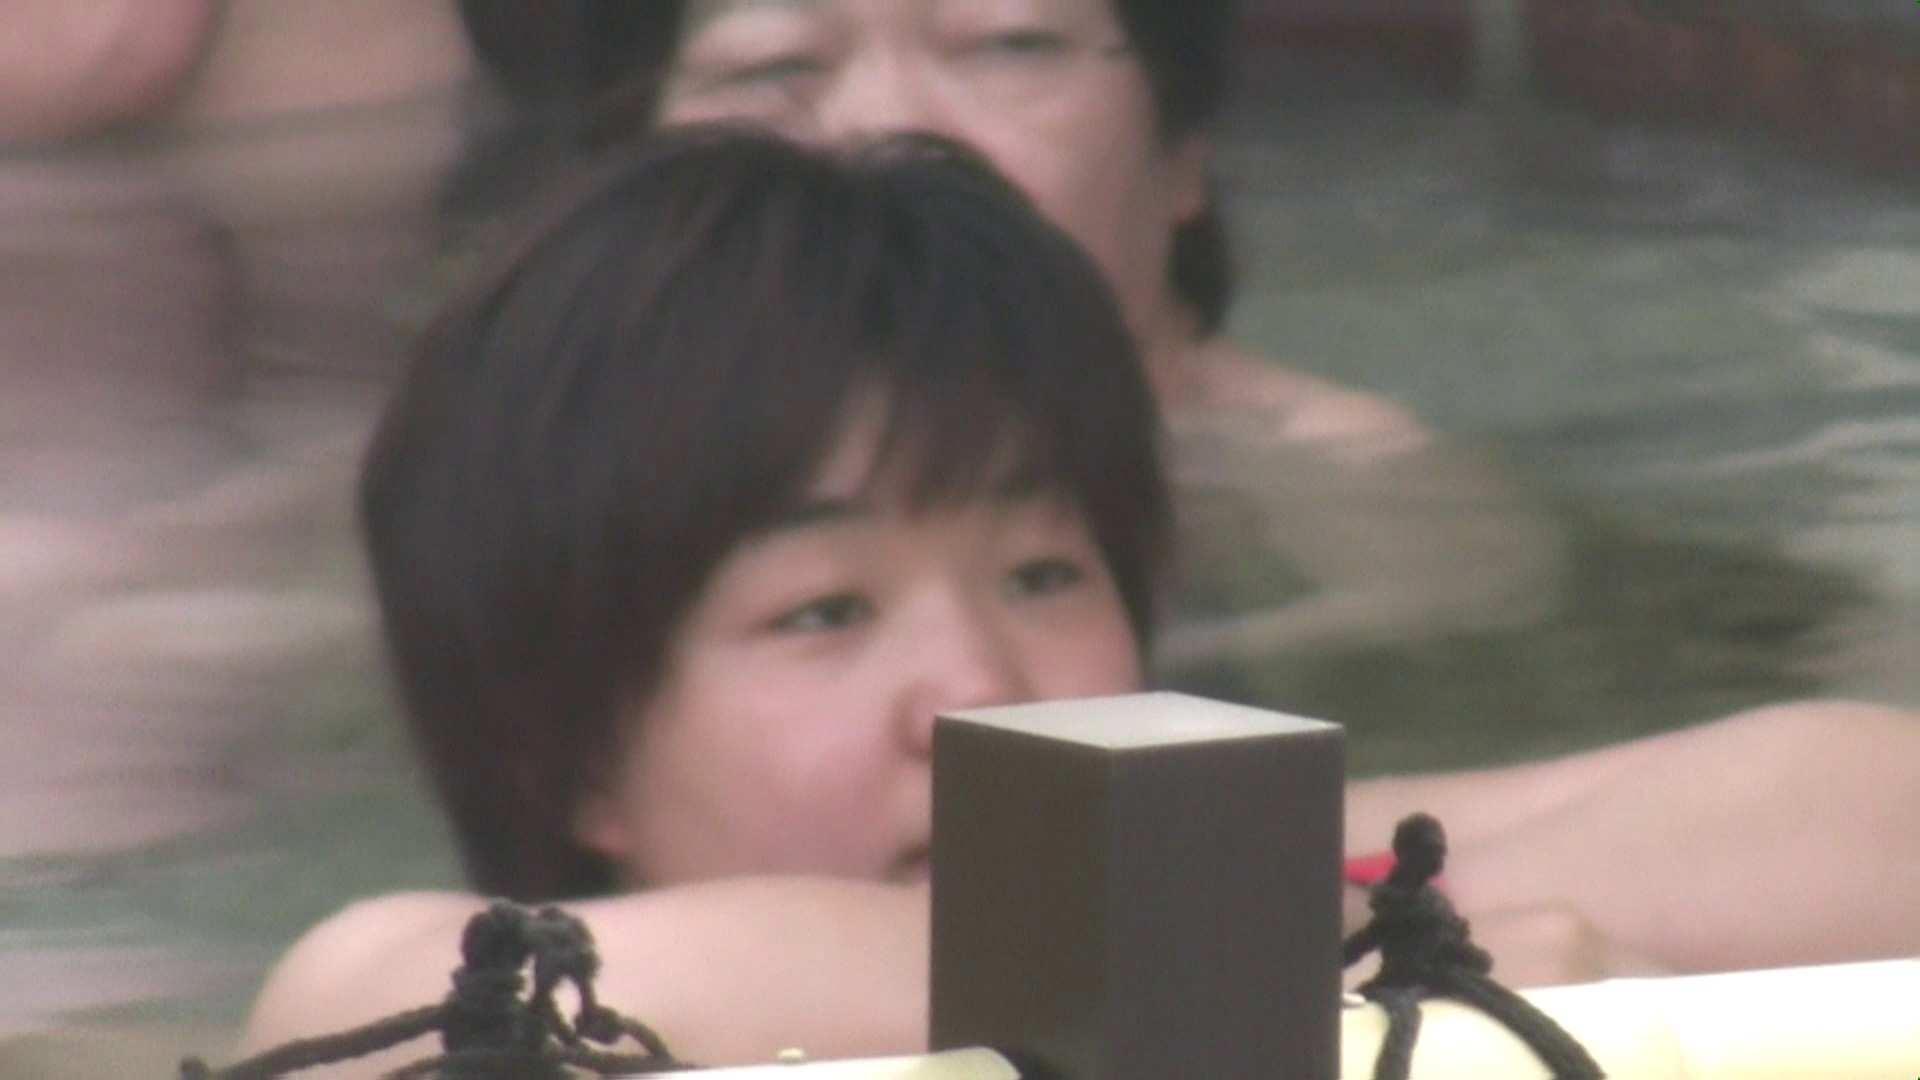 Aquaな露天風呂Vol.53【VIP限定】 盗撮師作品 おまんこ動画流出 78pic 32